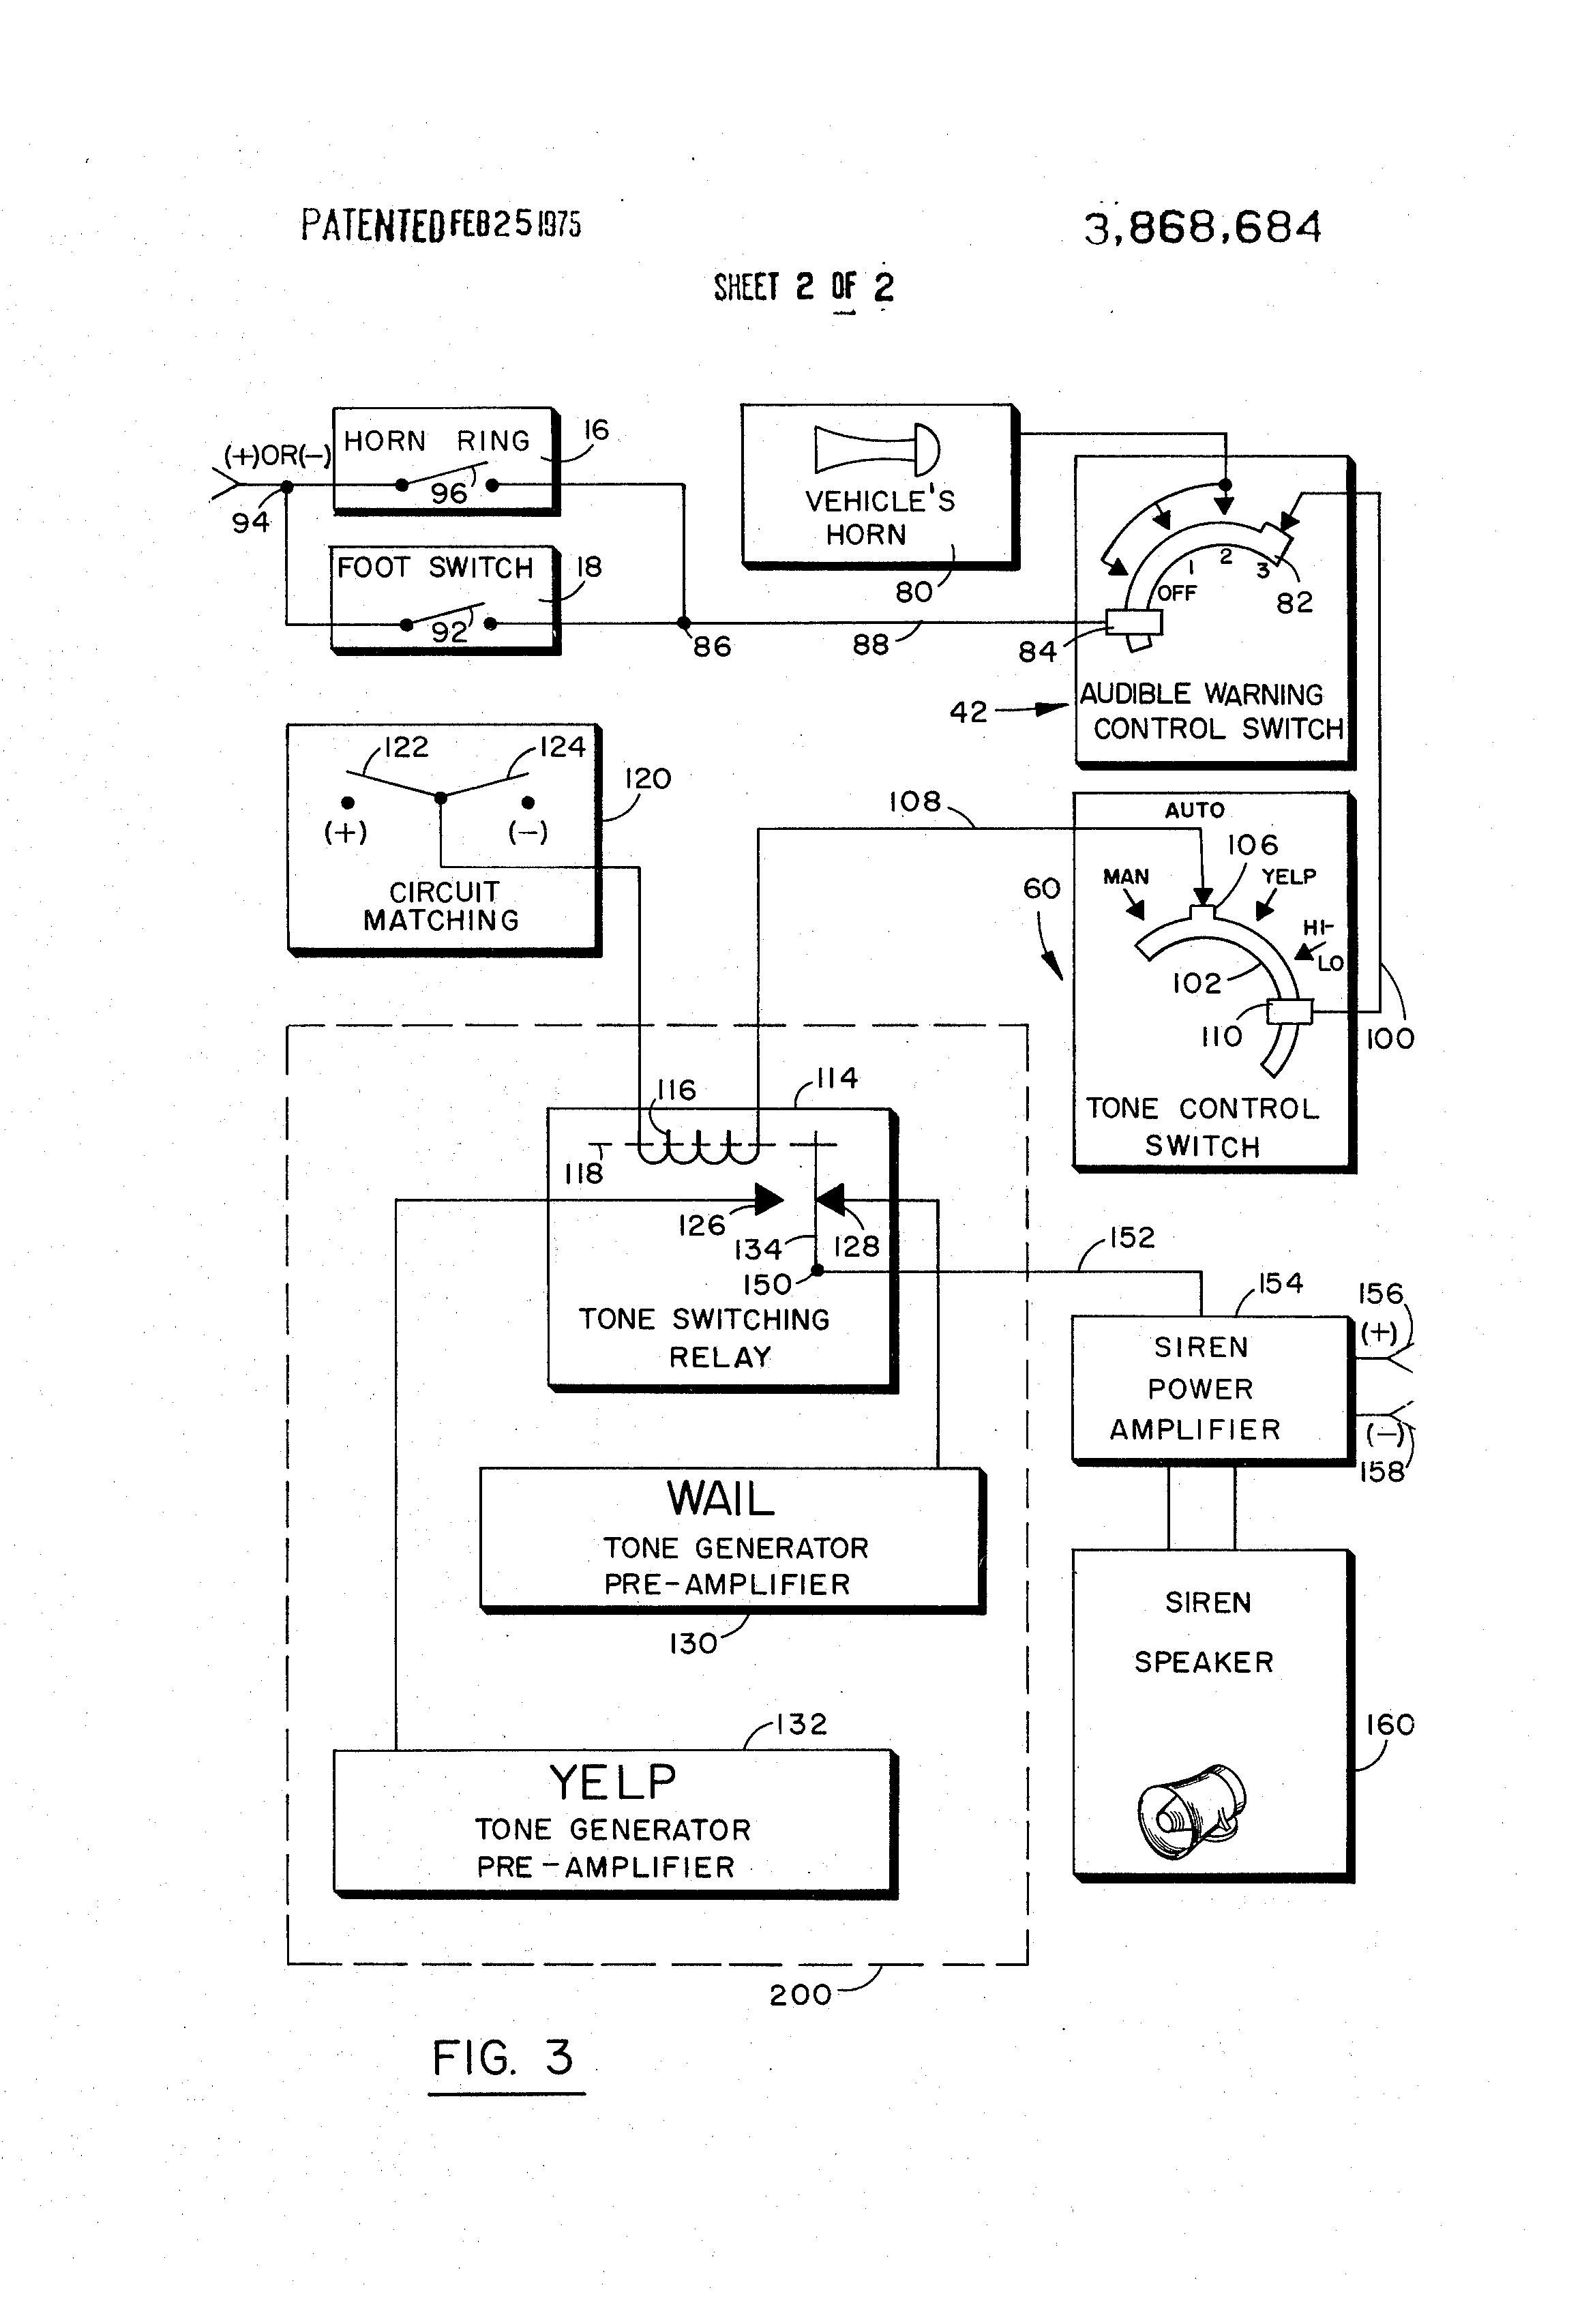 Astra 777 Car Alarm Wiring Diagram - Wiring Diagrams 101 on